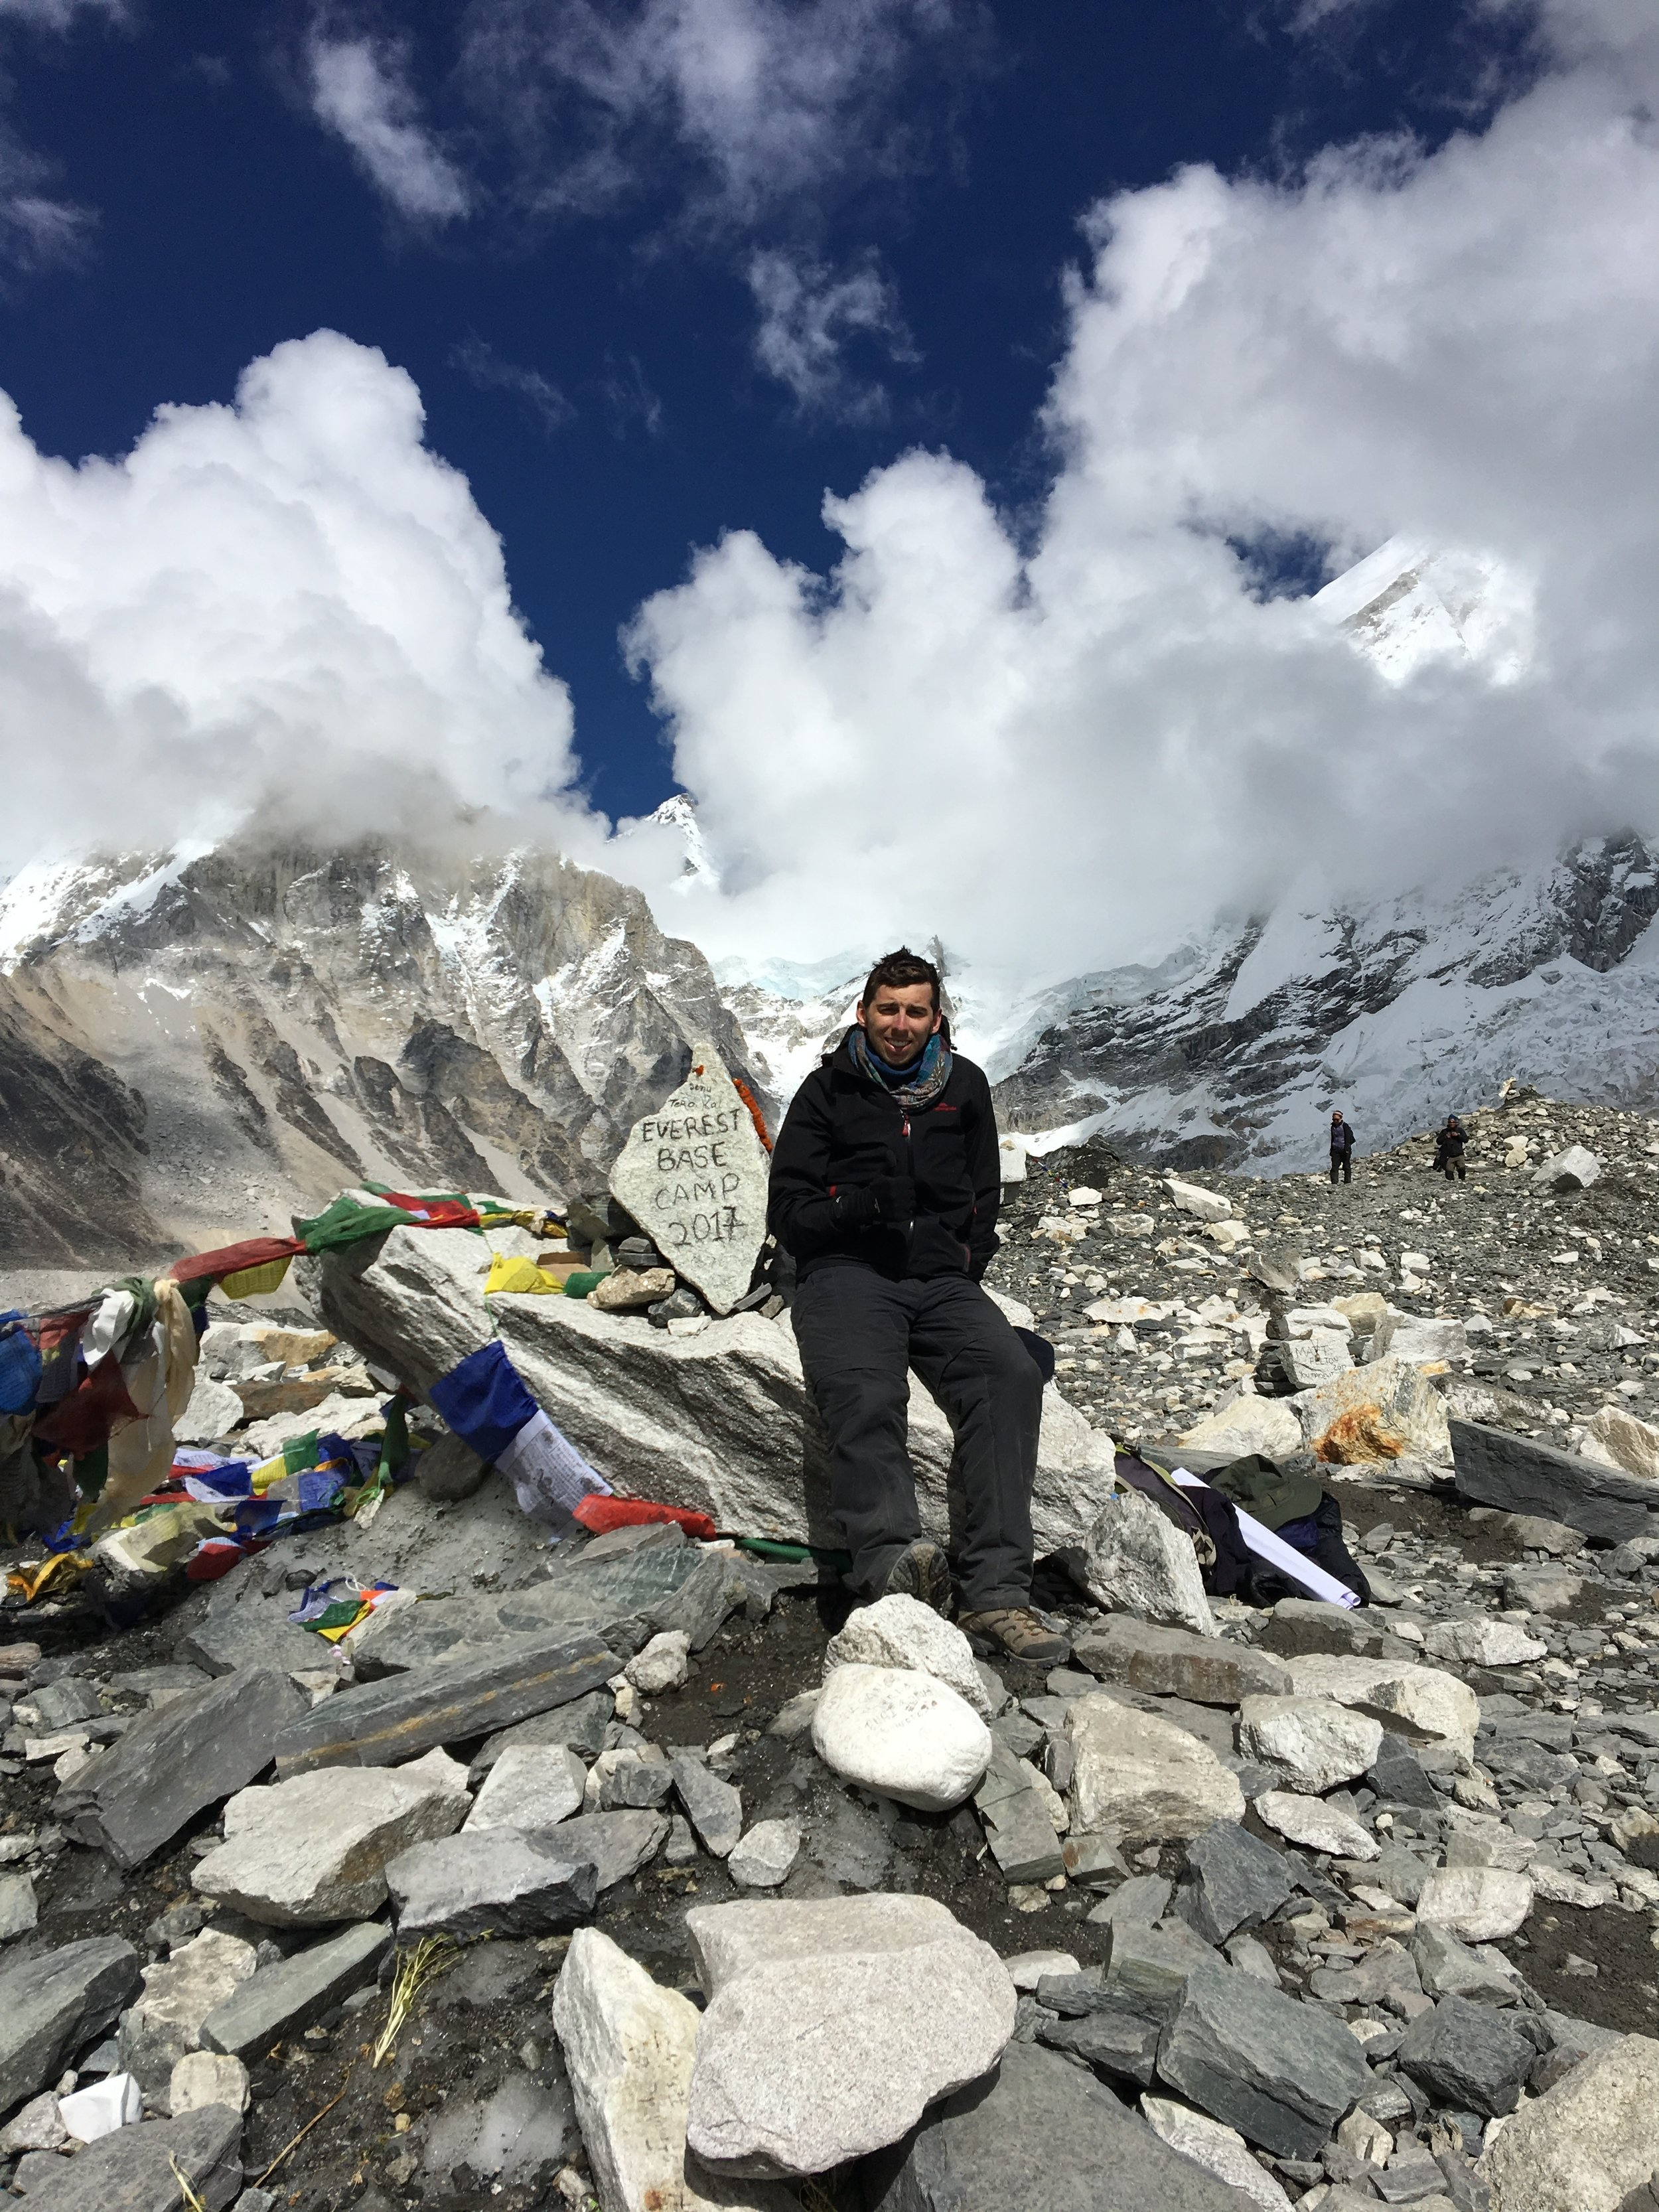 Mount Everest - Himalayas (2017)